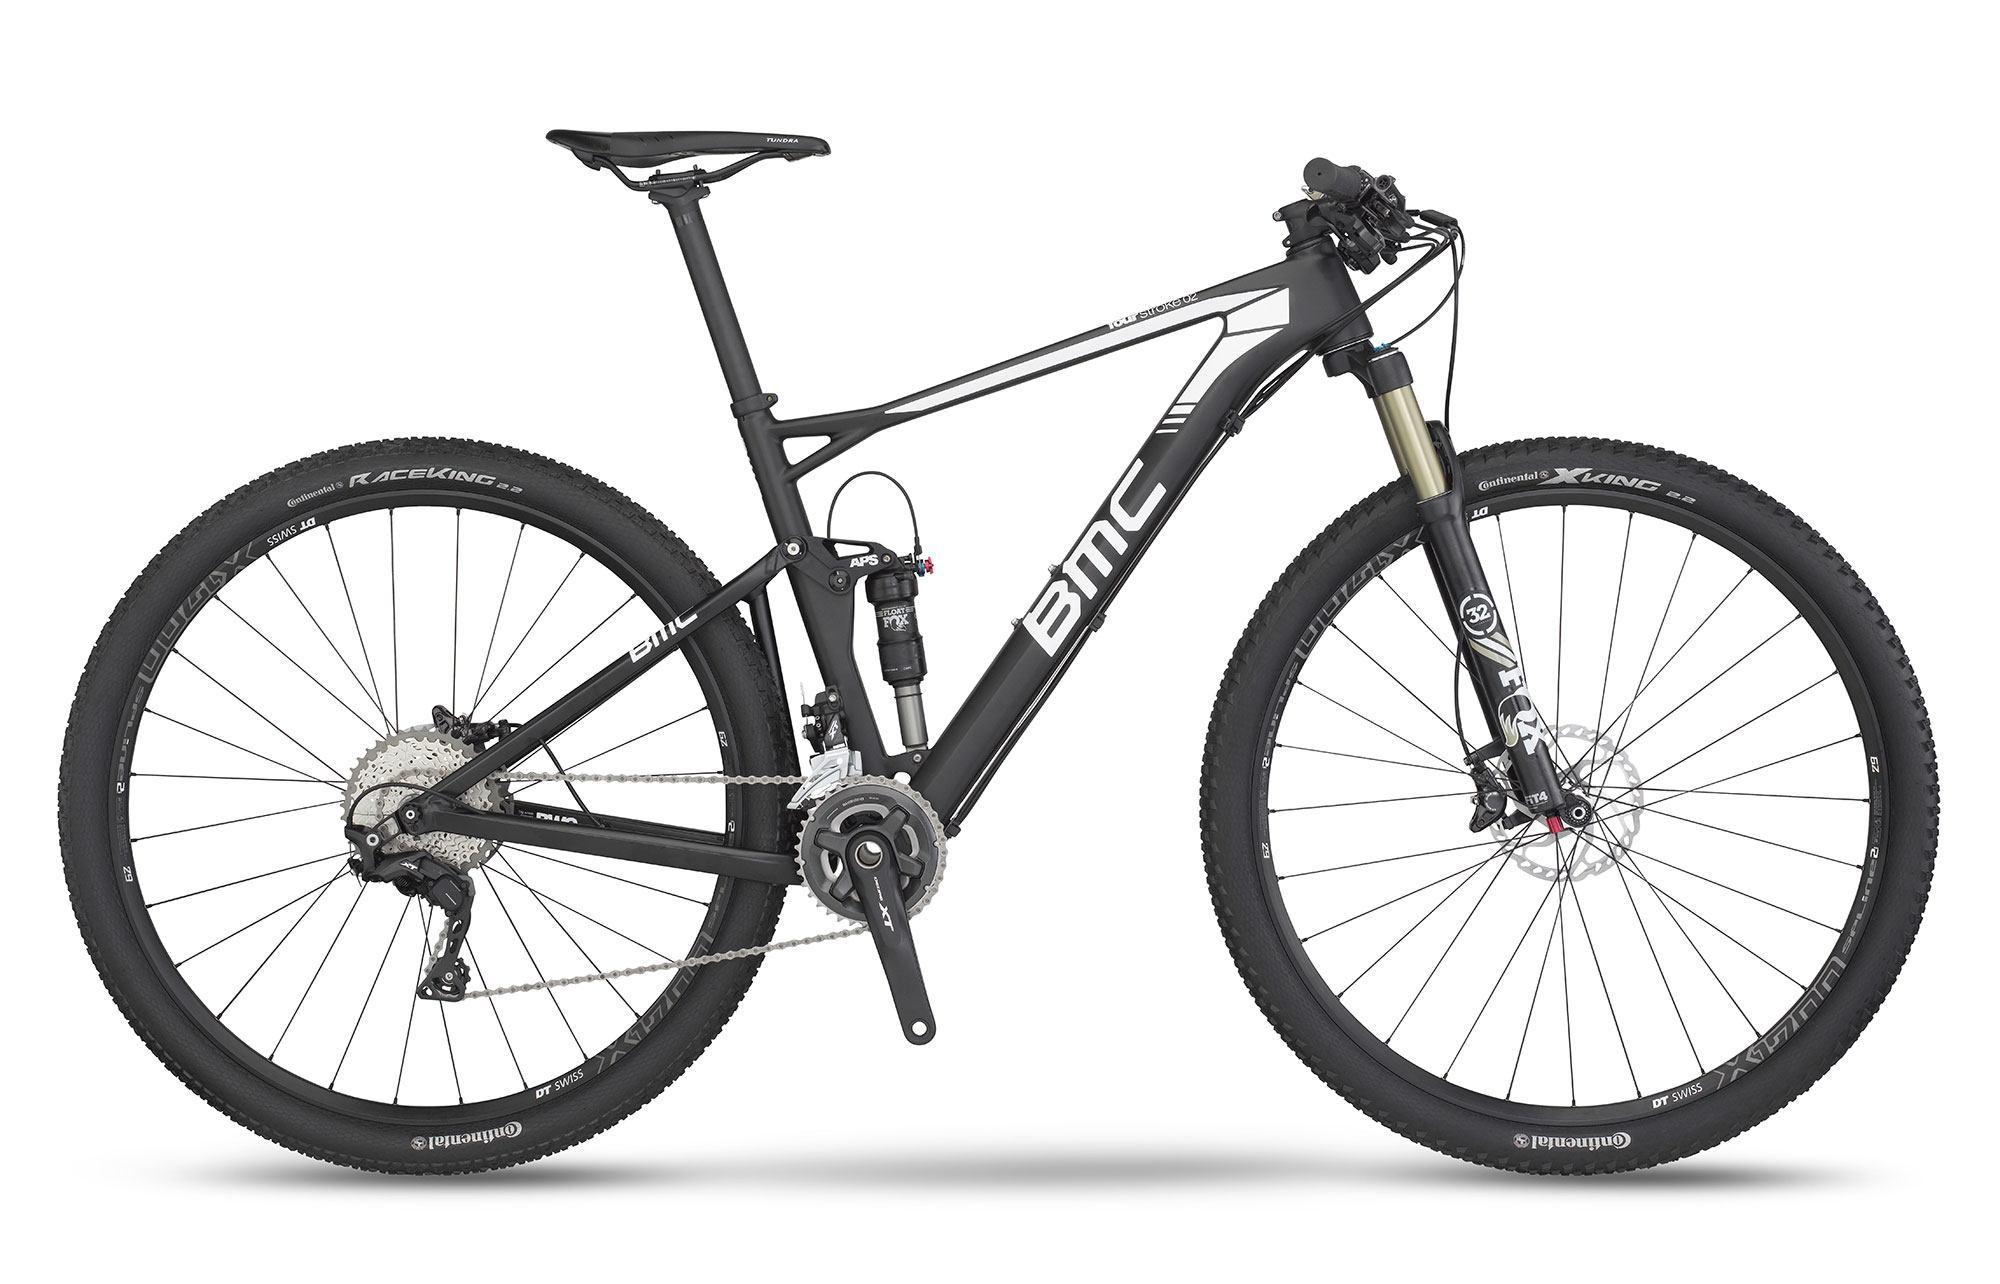 2016 Bmc Fourstroke 02 Xt Bike R Amp A Cycles